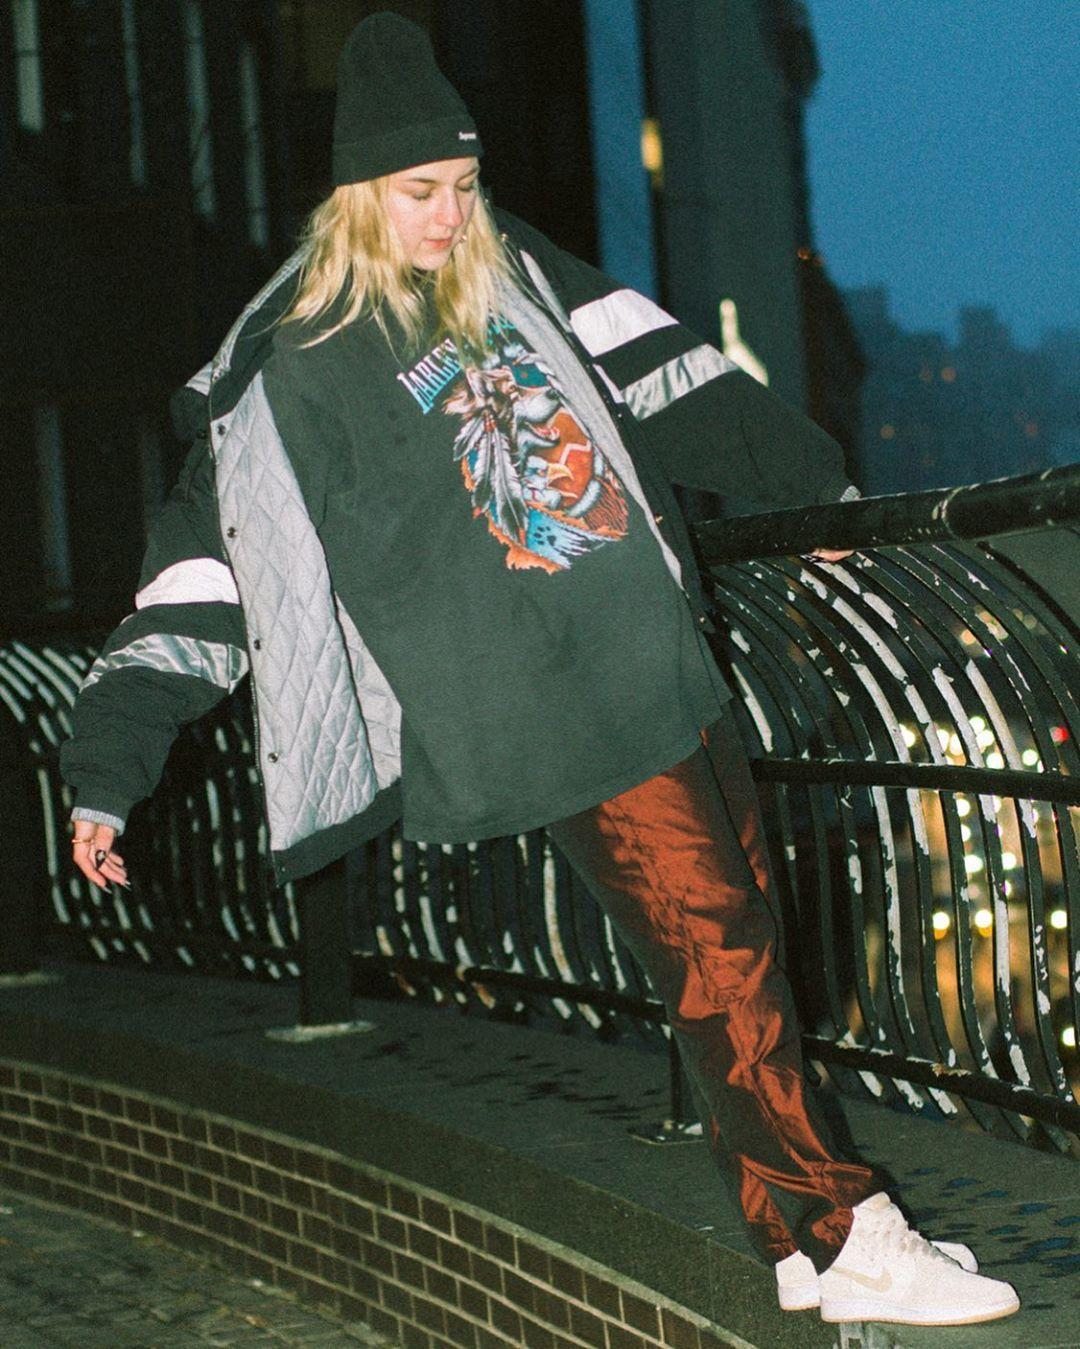 versace pants!!! • •...versace pants!!! • •  •  •  •  •  •  •  •  •  •  •  #nyc #photography #nycphotographer #nycphotography #fashionphotography #portraitphotography #portrait #versace #nike #harleydavidson #supreme #nike #heistshit #fff #ig_captures #portrait_vision #portraitmode #portrait_perfection #portrait_mood #fashionphotography #stylephotography #streetstyle #streetstyleinspo #nycstreetstyle #streetphotography #hypebae #highsnobietystyle #highsnobiety